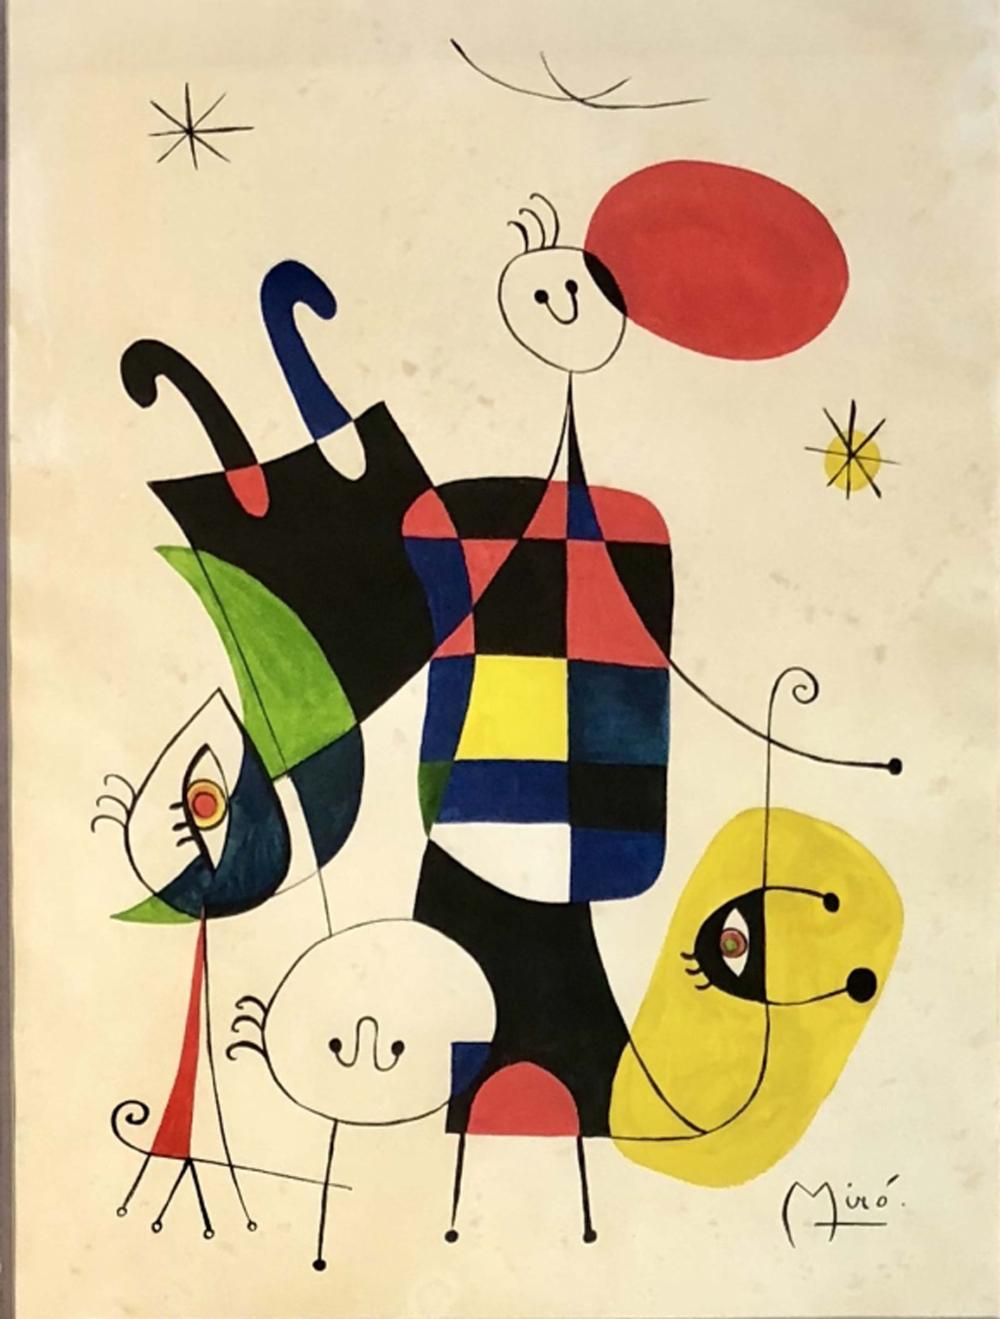 Joan Miro Mixed Media On Paper V 6 500 Joan Miró Para Niños Joan Miro Pinturas Cuadros De Joan Miro